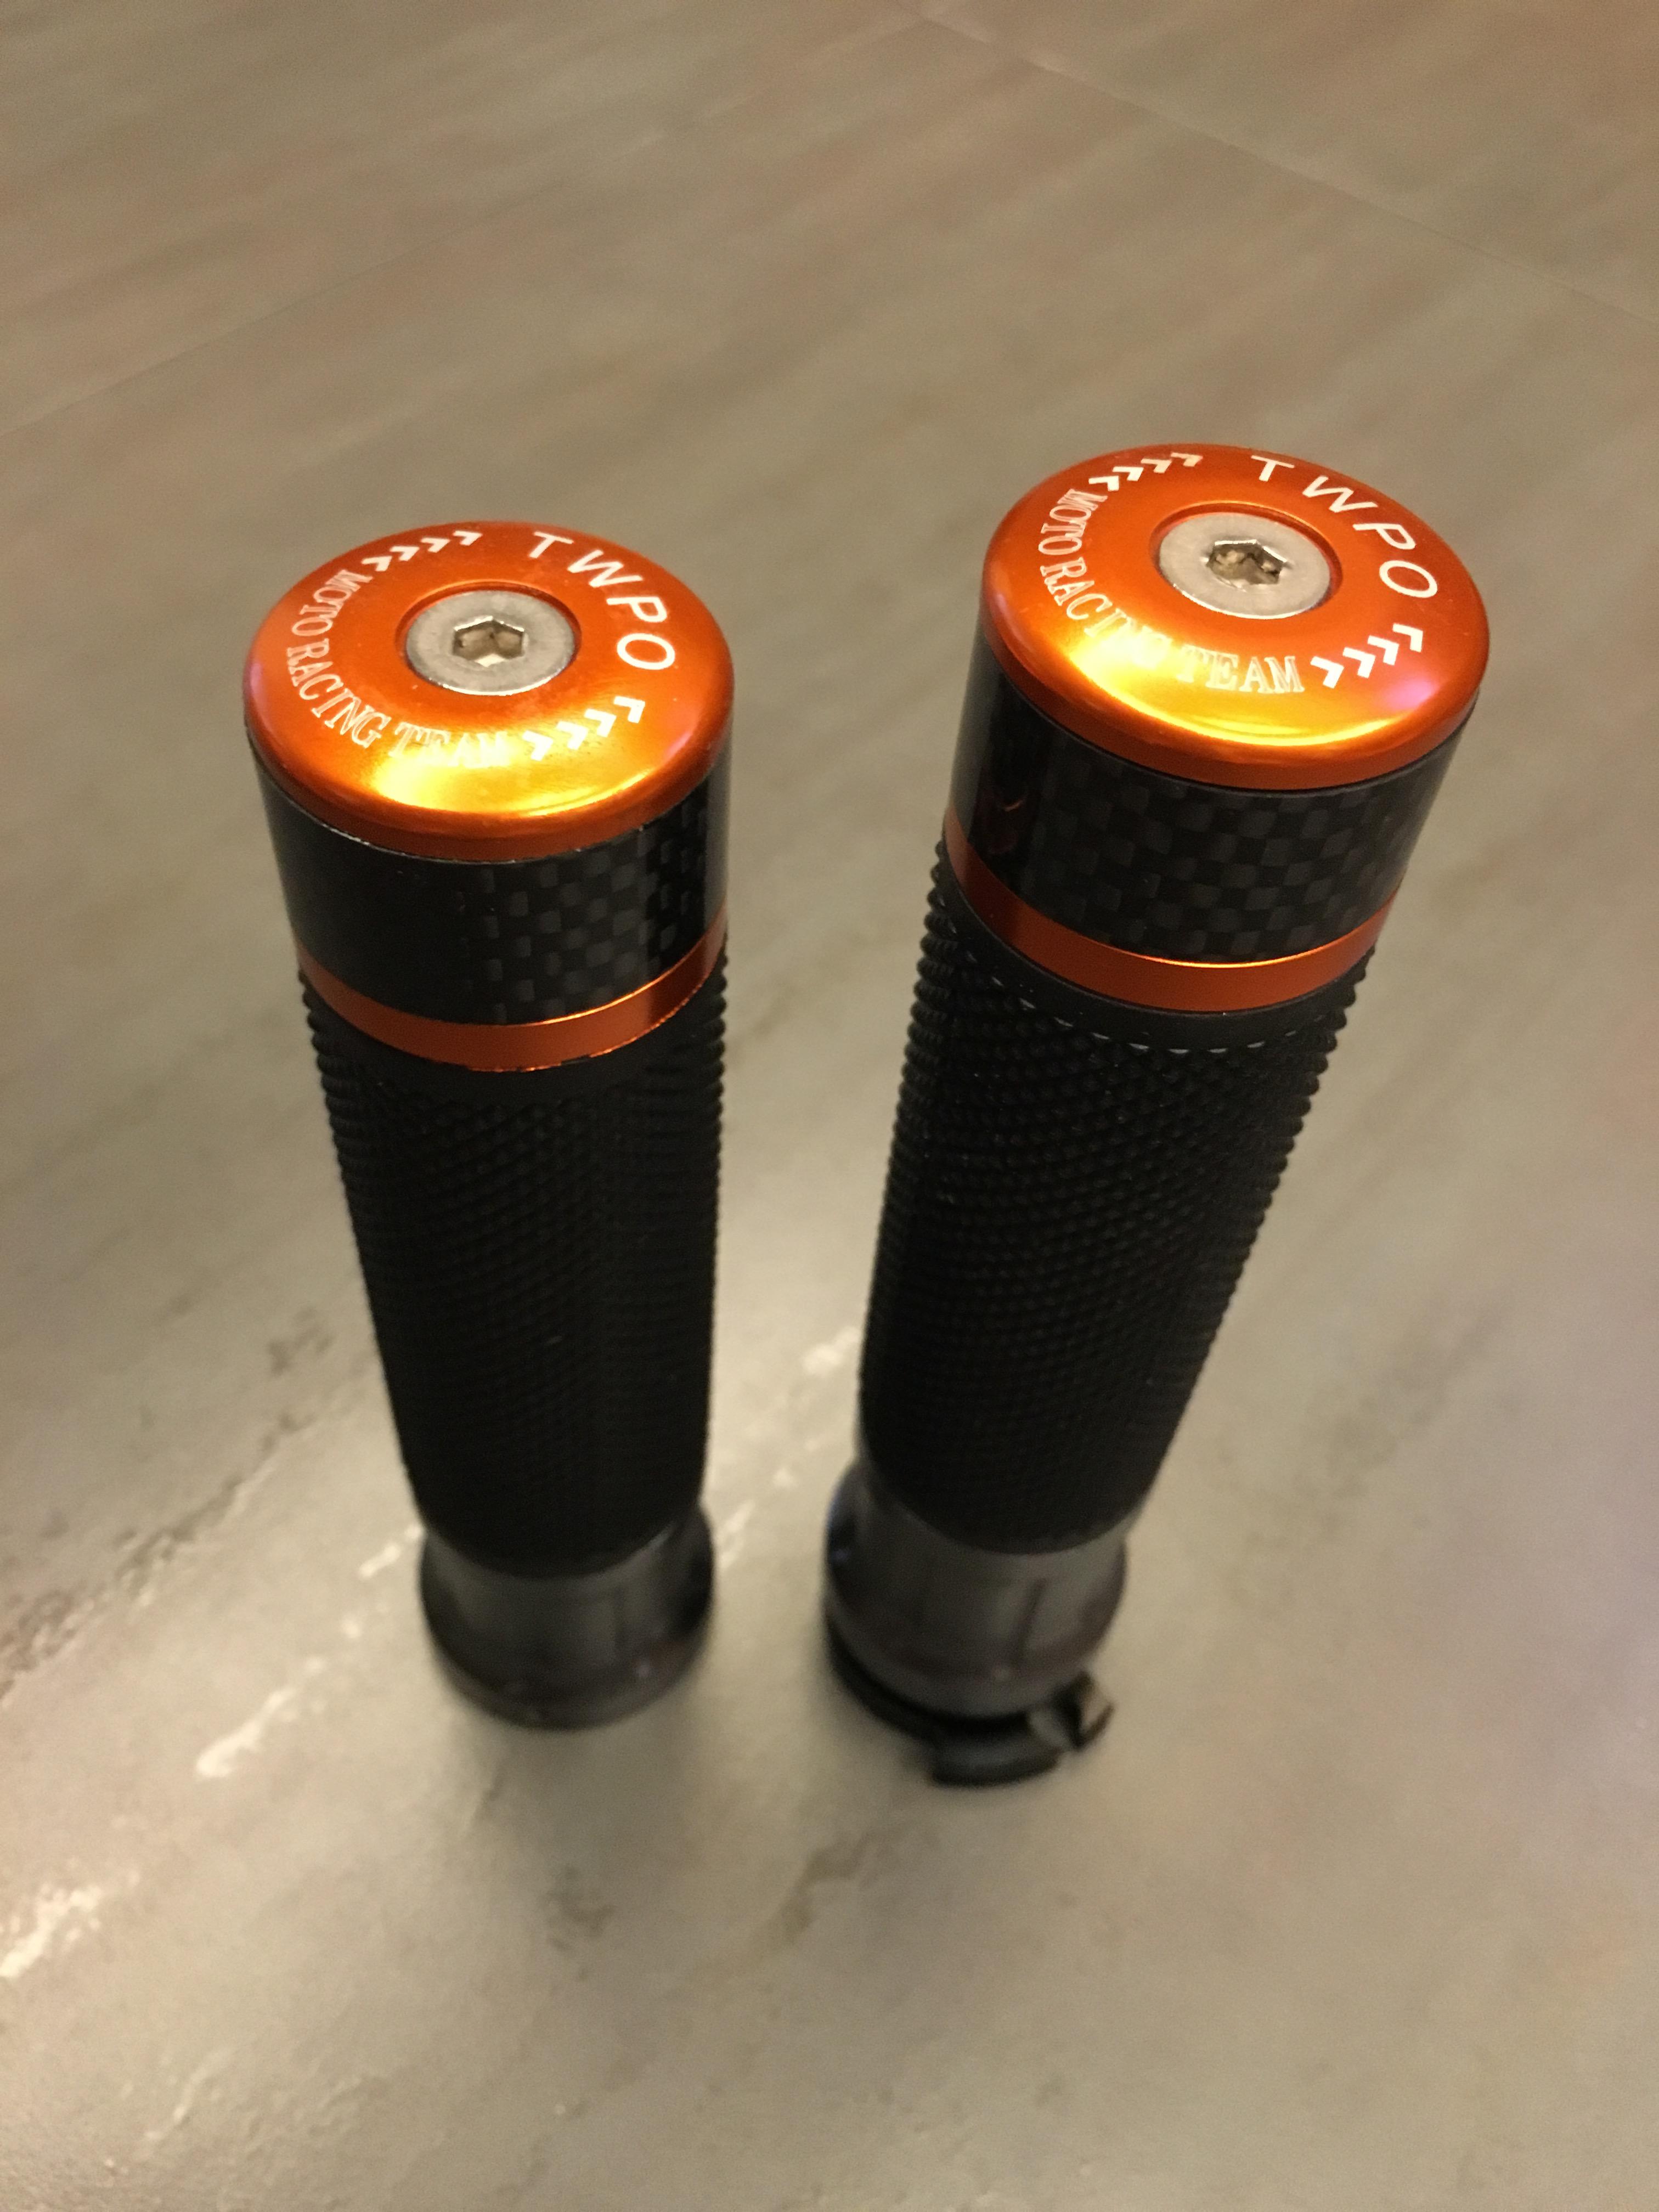 【改裝王國】TWPO HONDA MSX125 一體式碳纖維握把套